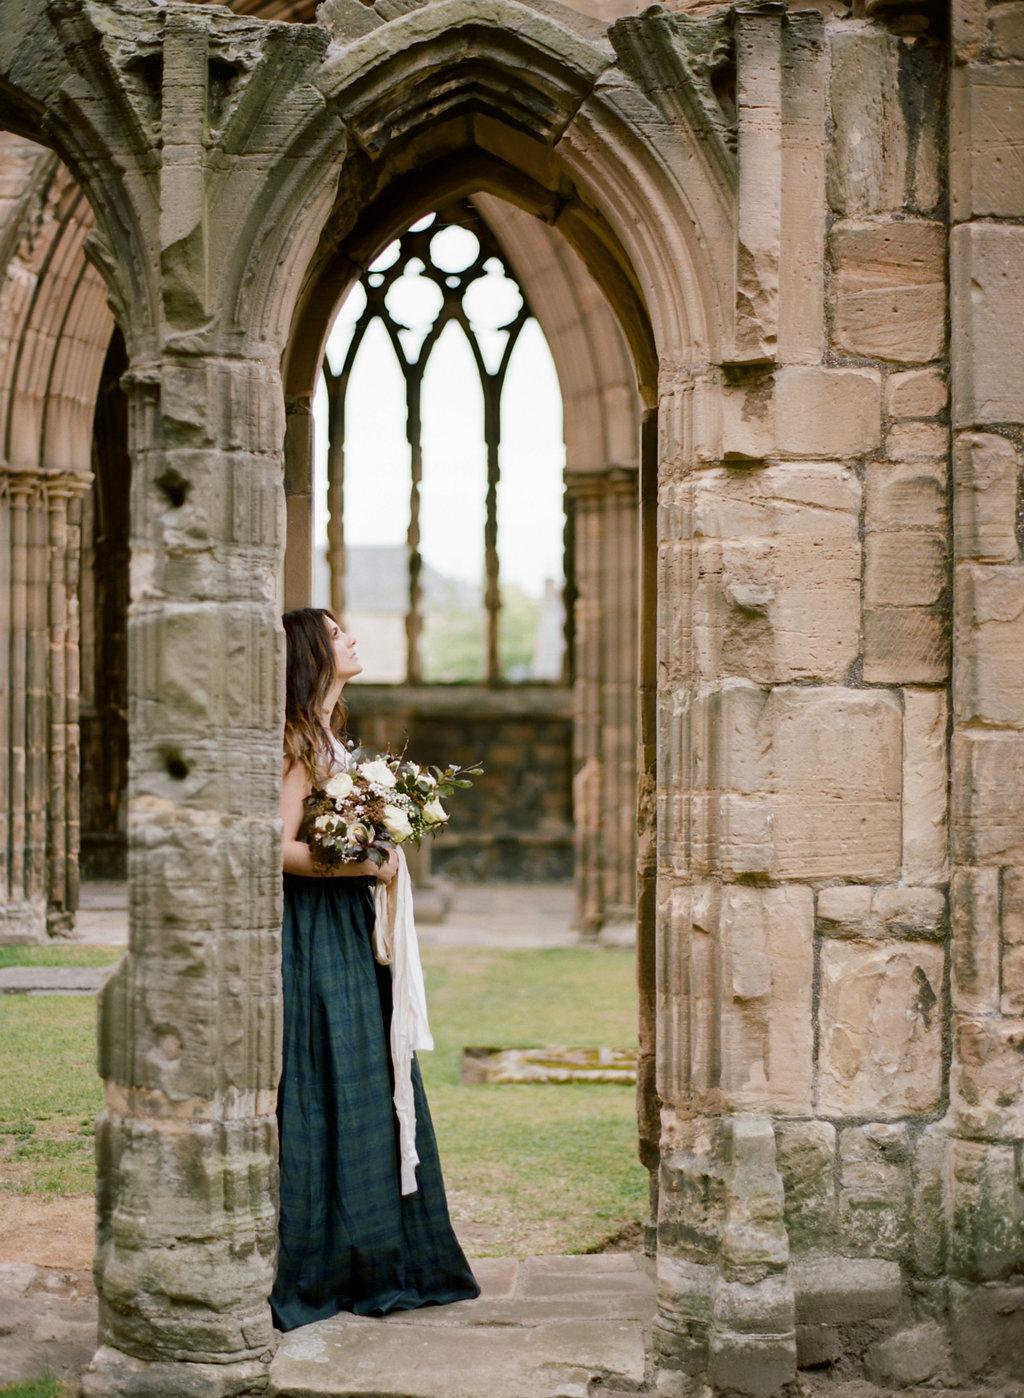 Scotland-Prewedding-highlands-castle-Engagment-Photos-Katie-Grant (60 of 139).jpg